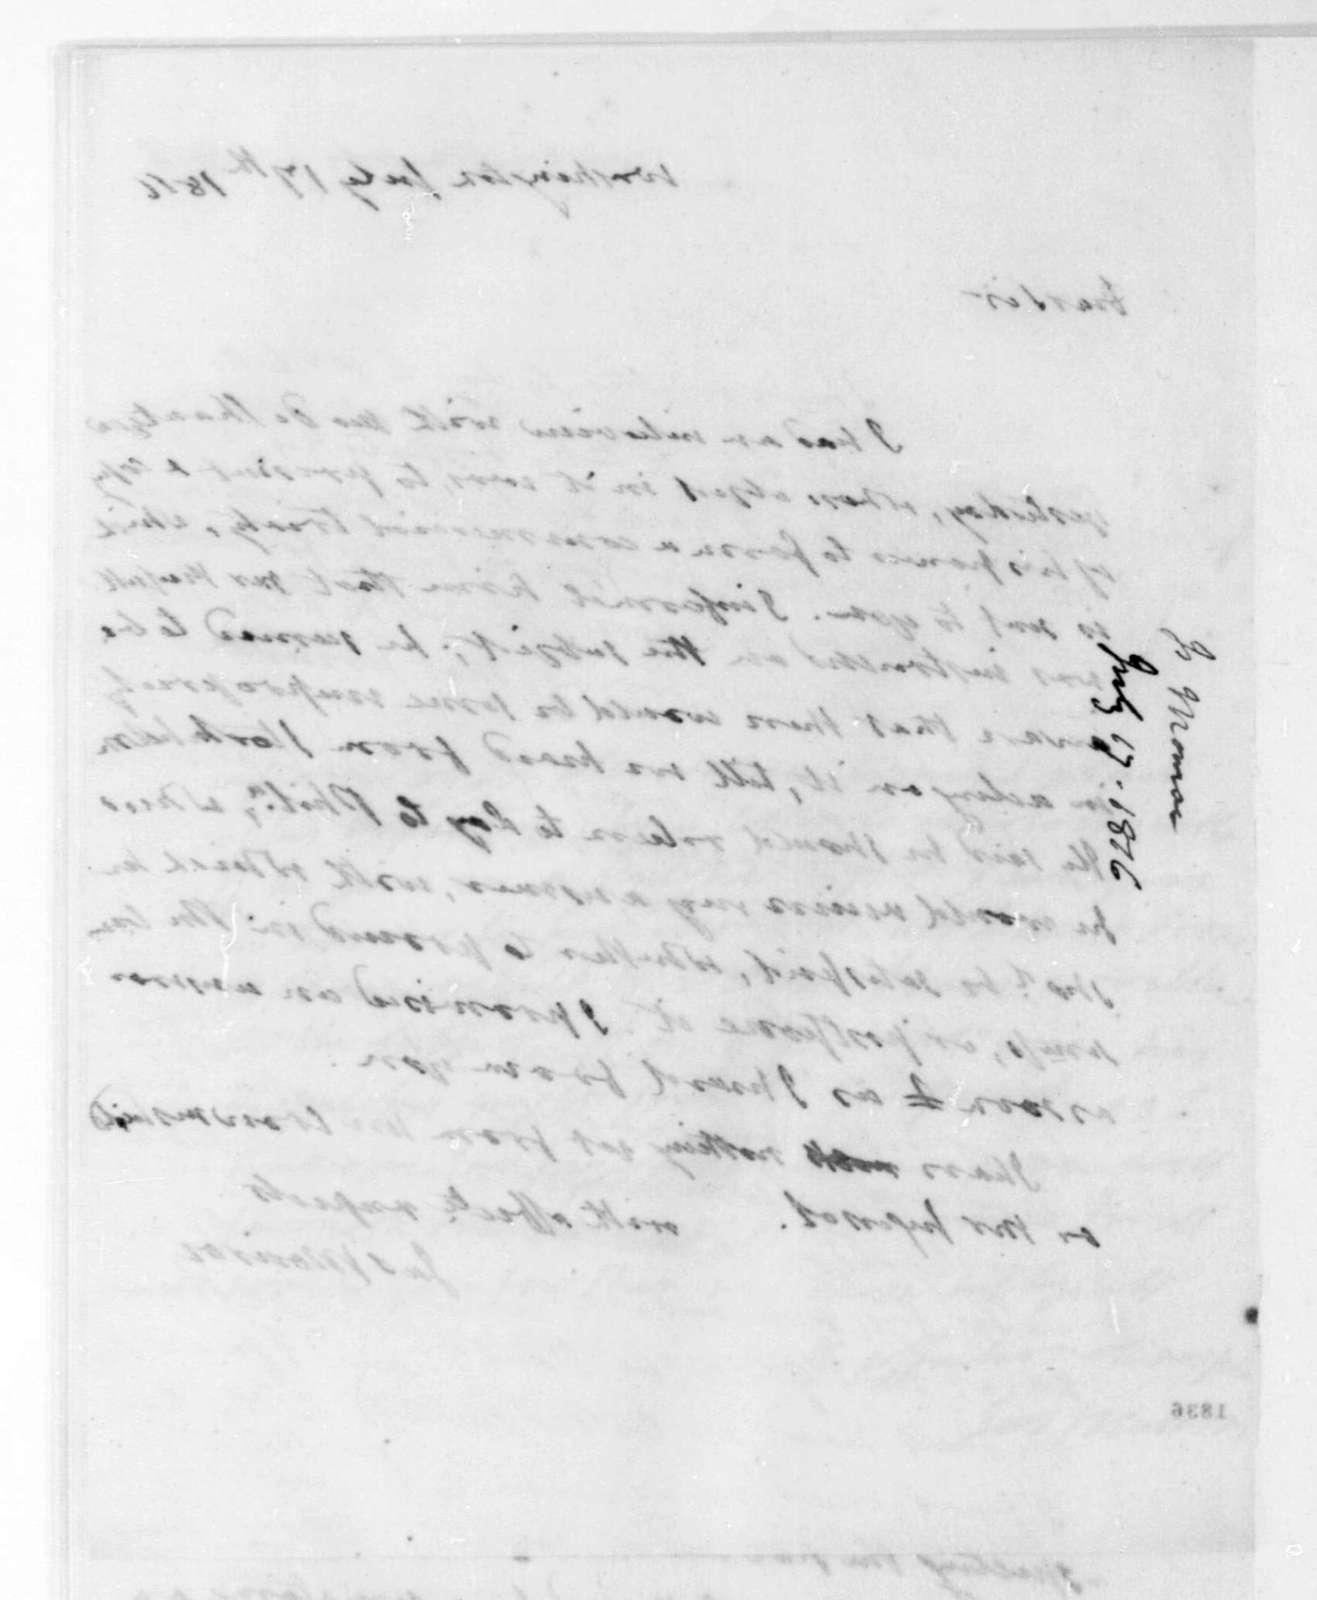 James Monroe to James Madison, July 17, 1816.